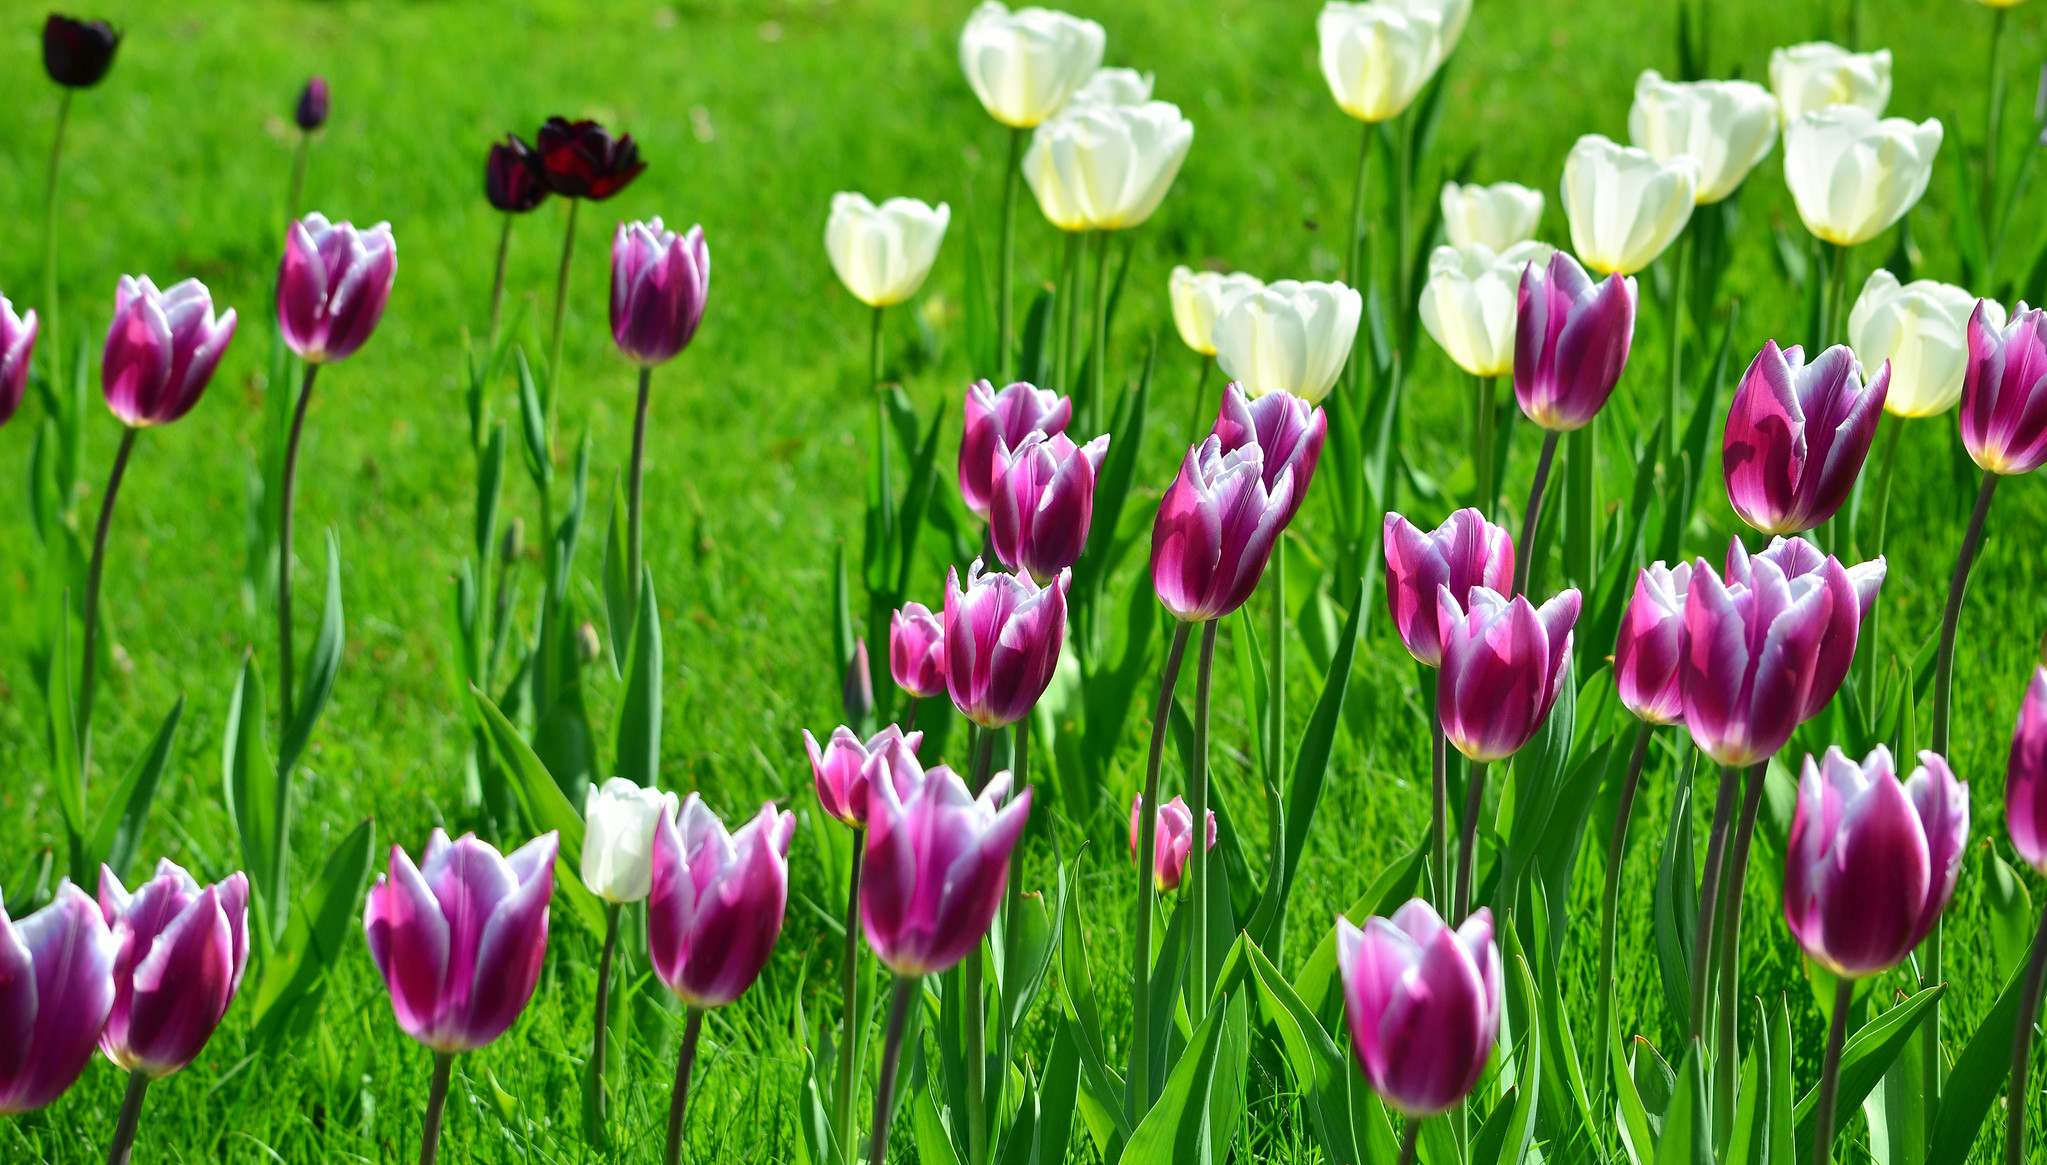 hever castle10 Tulip Festival  at Hever Castle, Kent